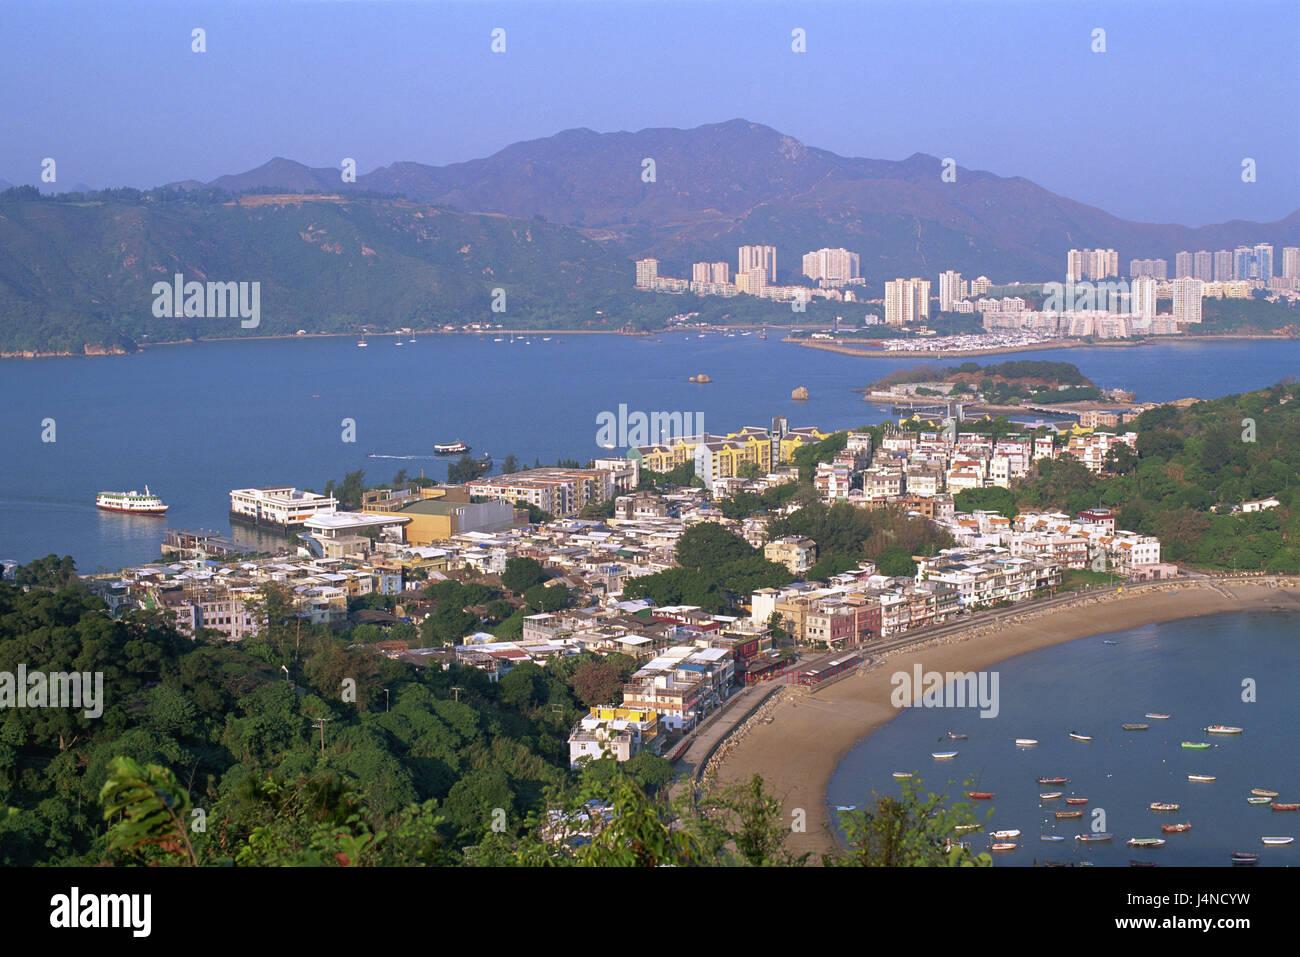 China, Hong Kong, Bang Chau Iceland, background Lantau Iceland, Discovery Bay, sea, Asia, town, island, coast, coastal - Stock Image